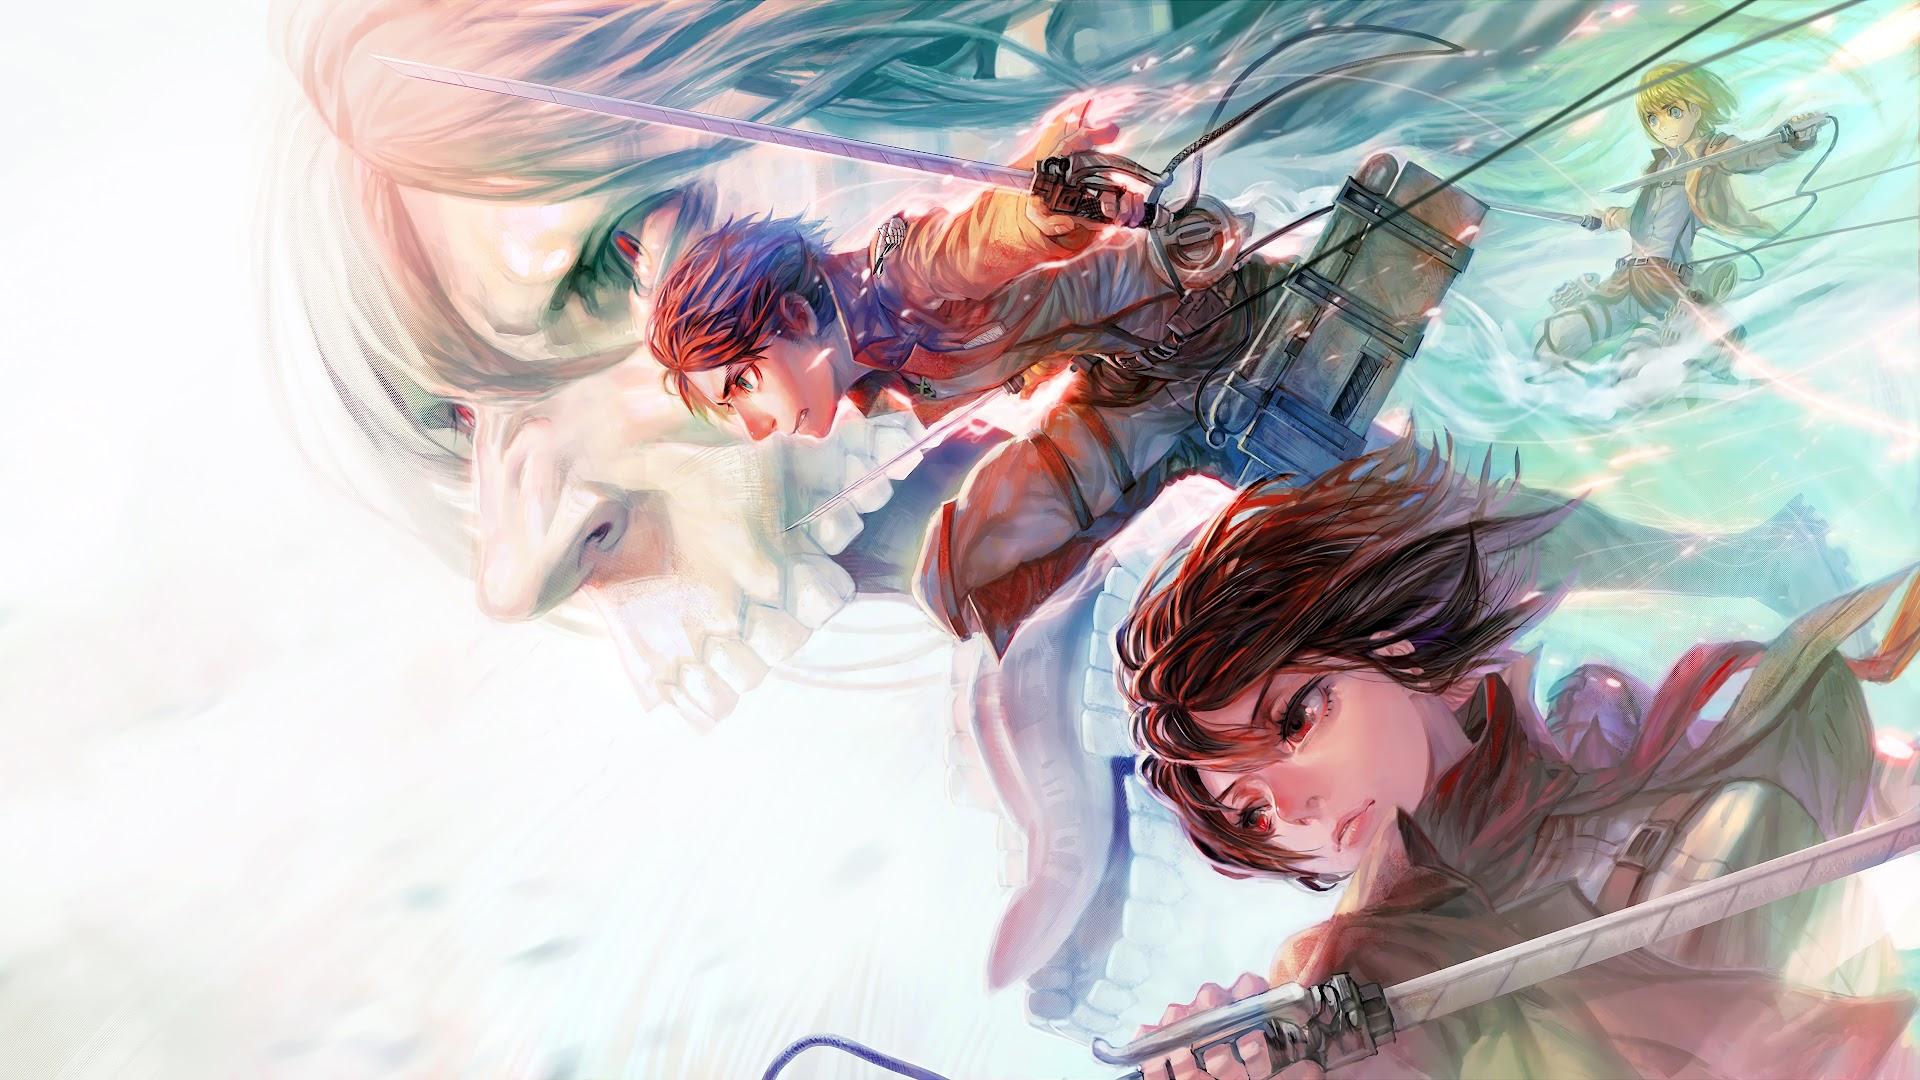 Mikasa Eren Armin Attack Titan Attack On Titan 4k Wallpaper 158